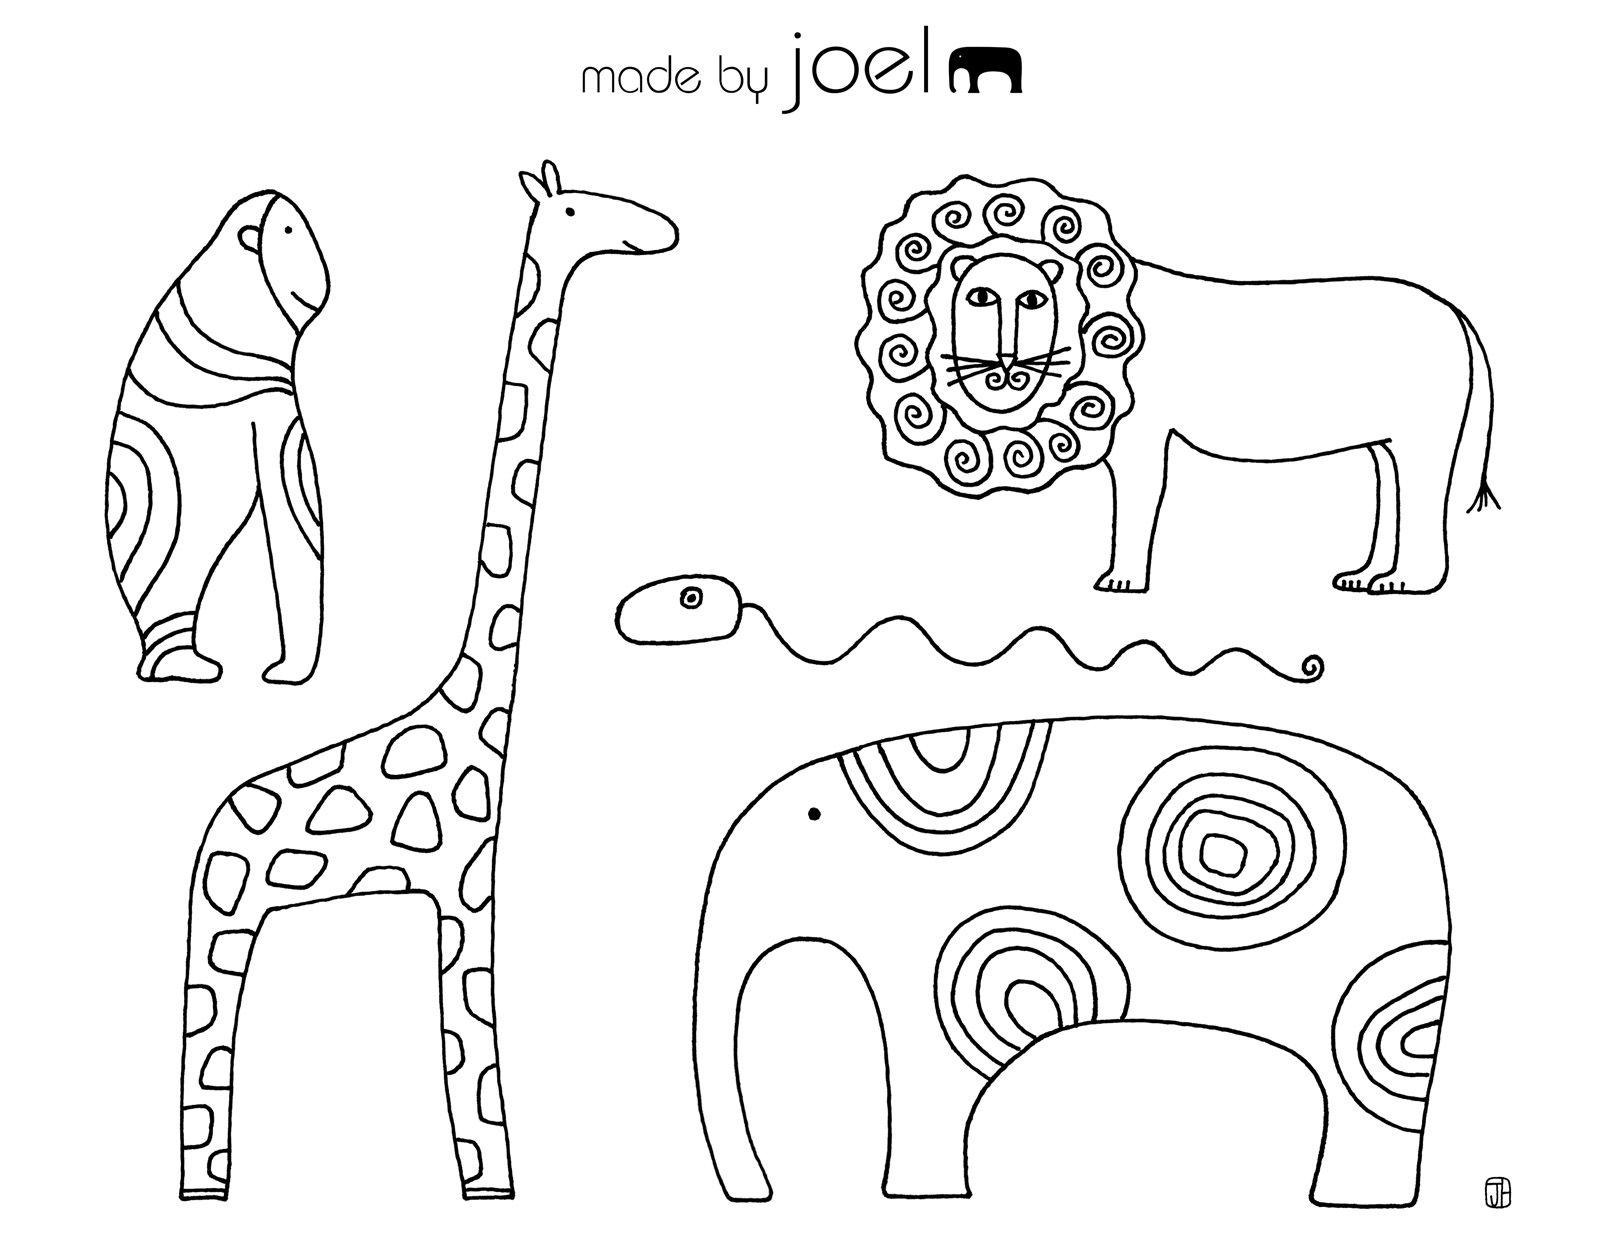 Desenhos de flores e de animais para imprimir | Pinterest | Colorear ...